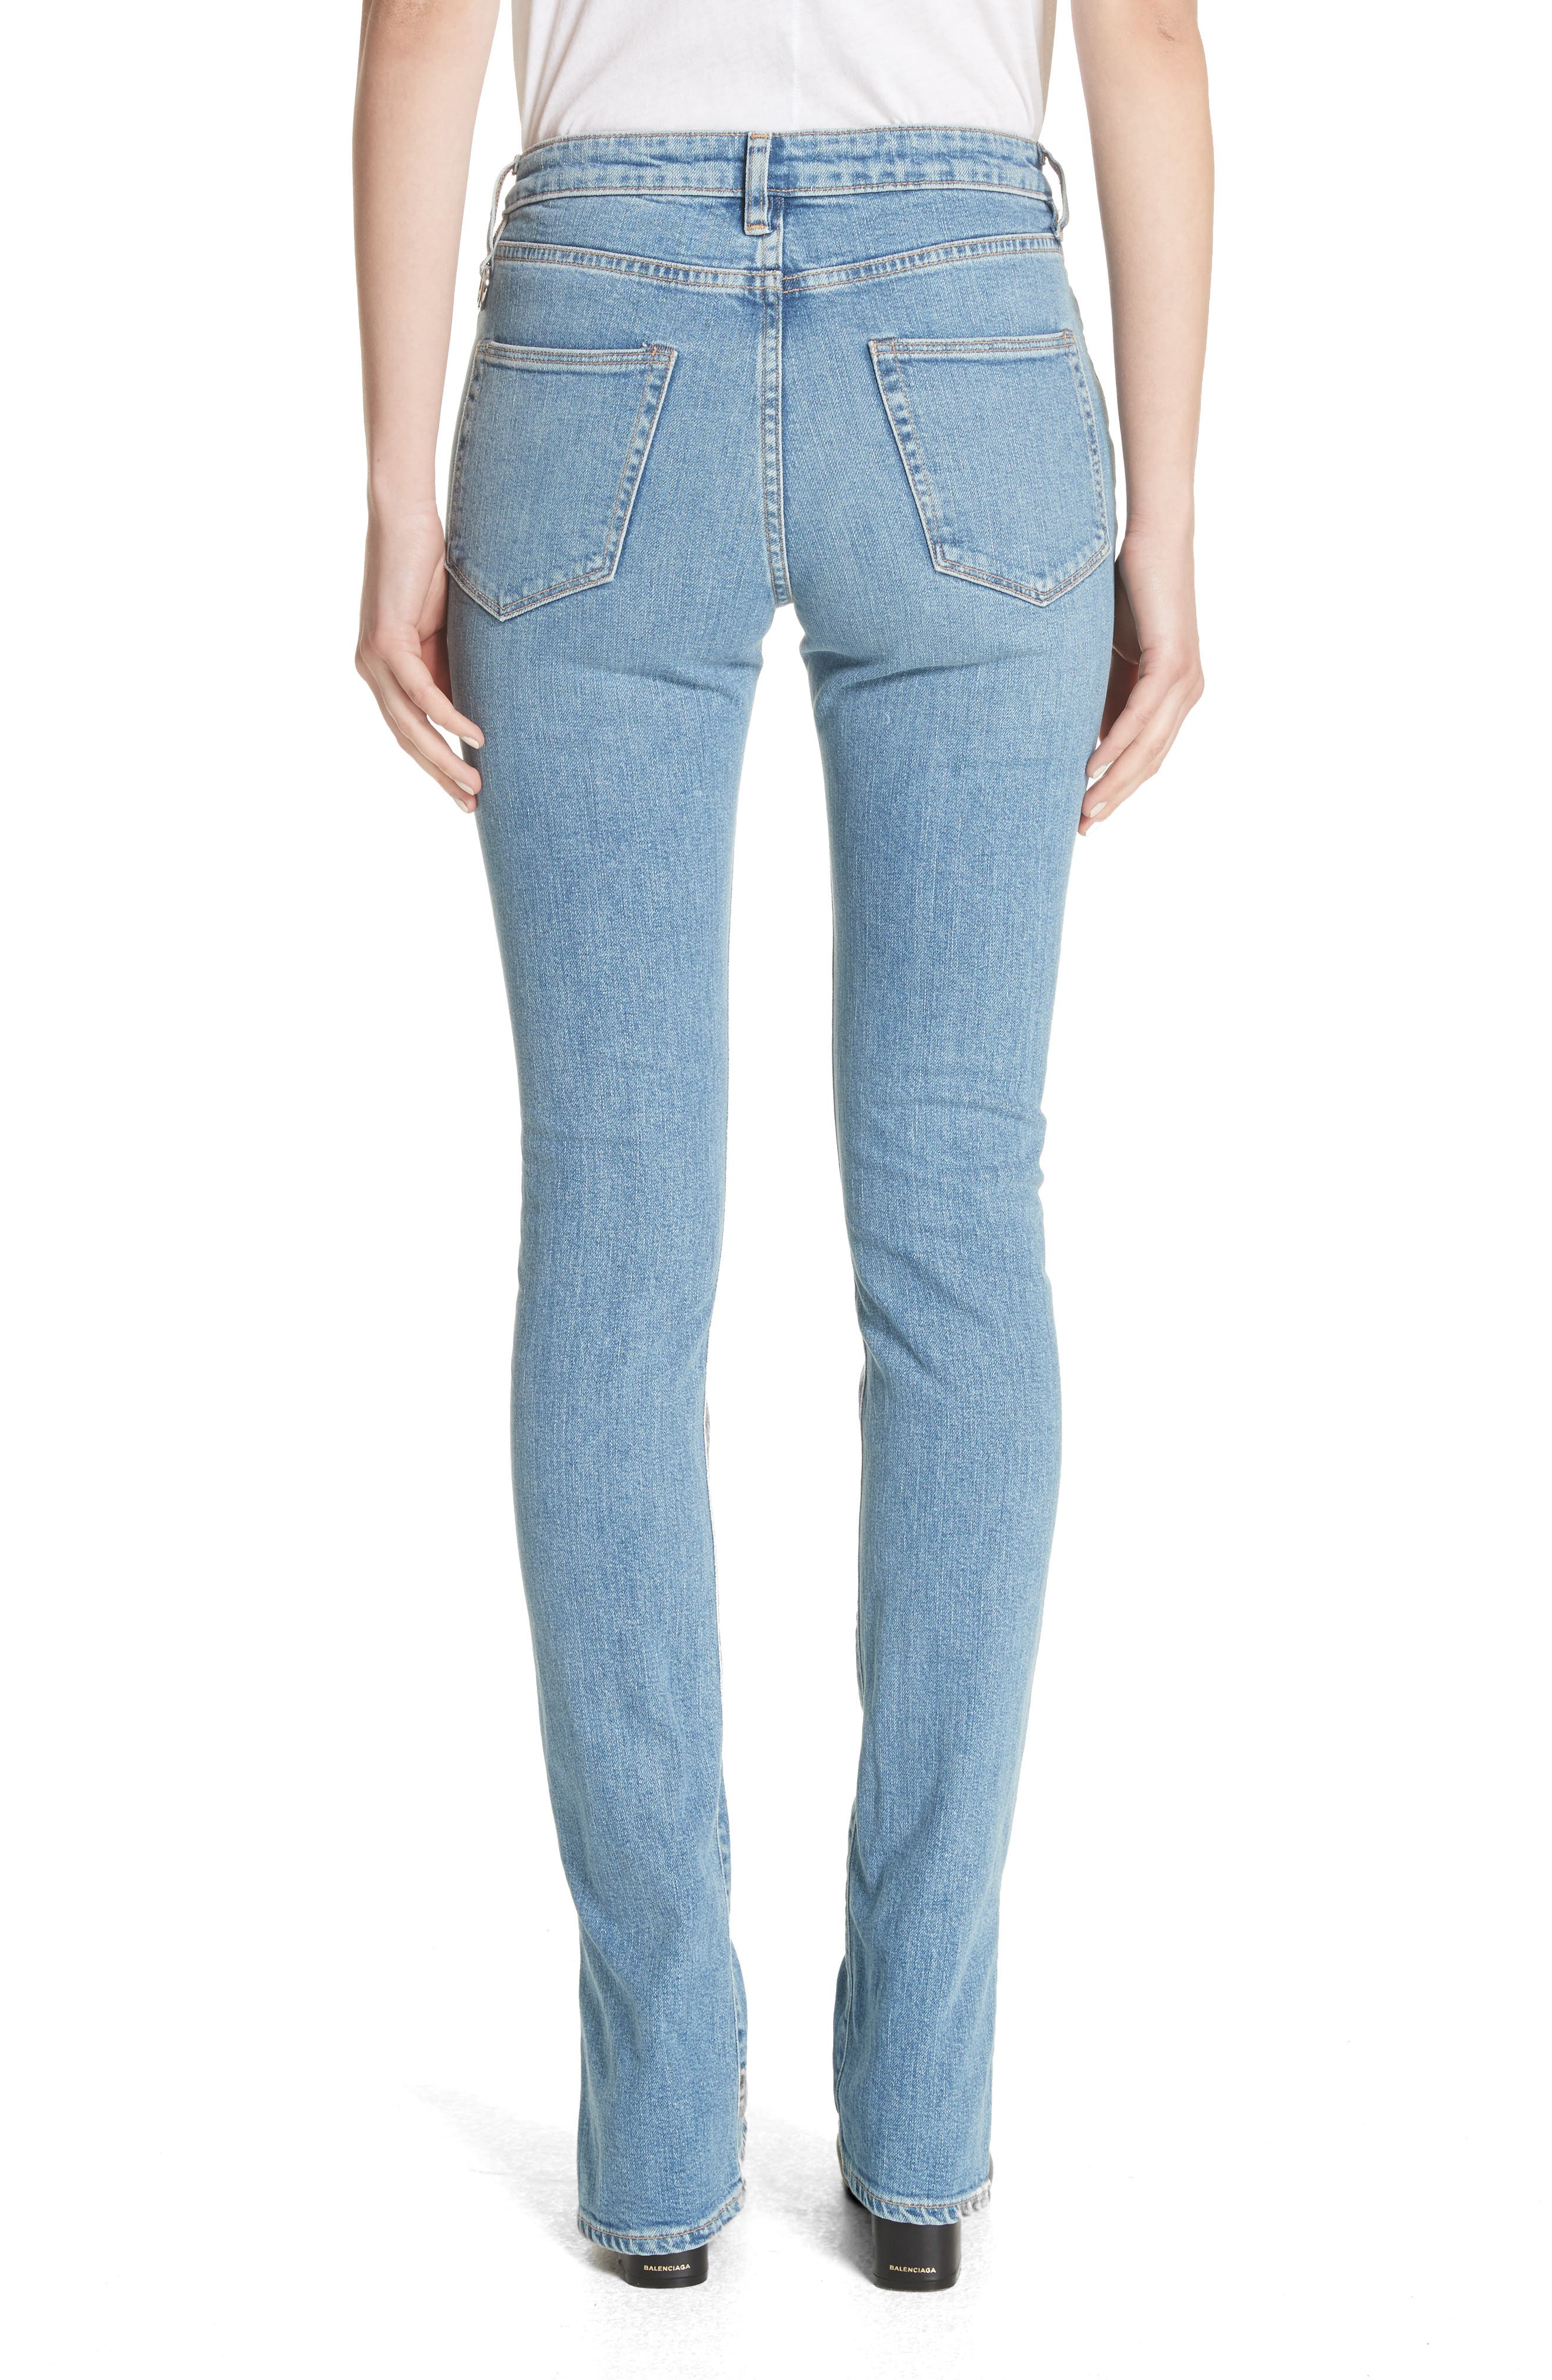 Lowry Split Hem Jeans,                             Alternate thumbnail 2, color,                             Mid Indigo Wash